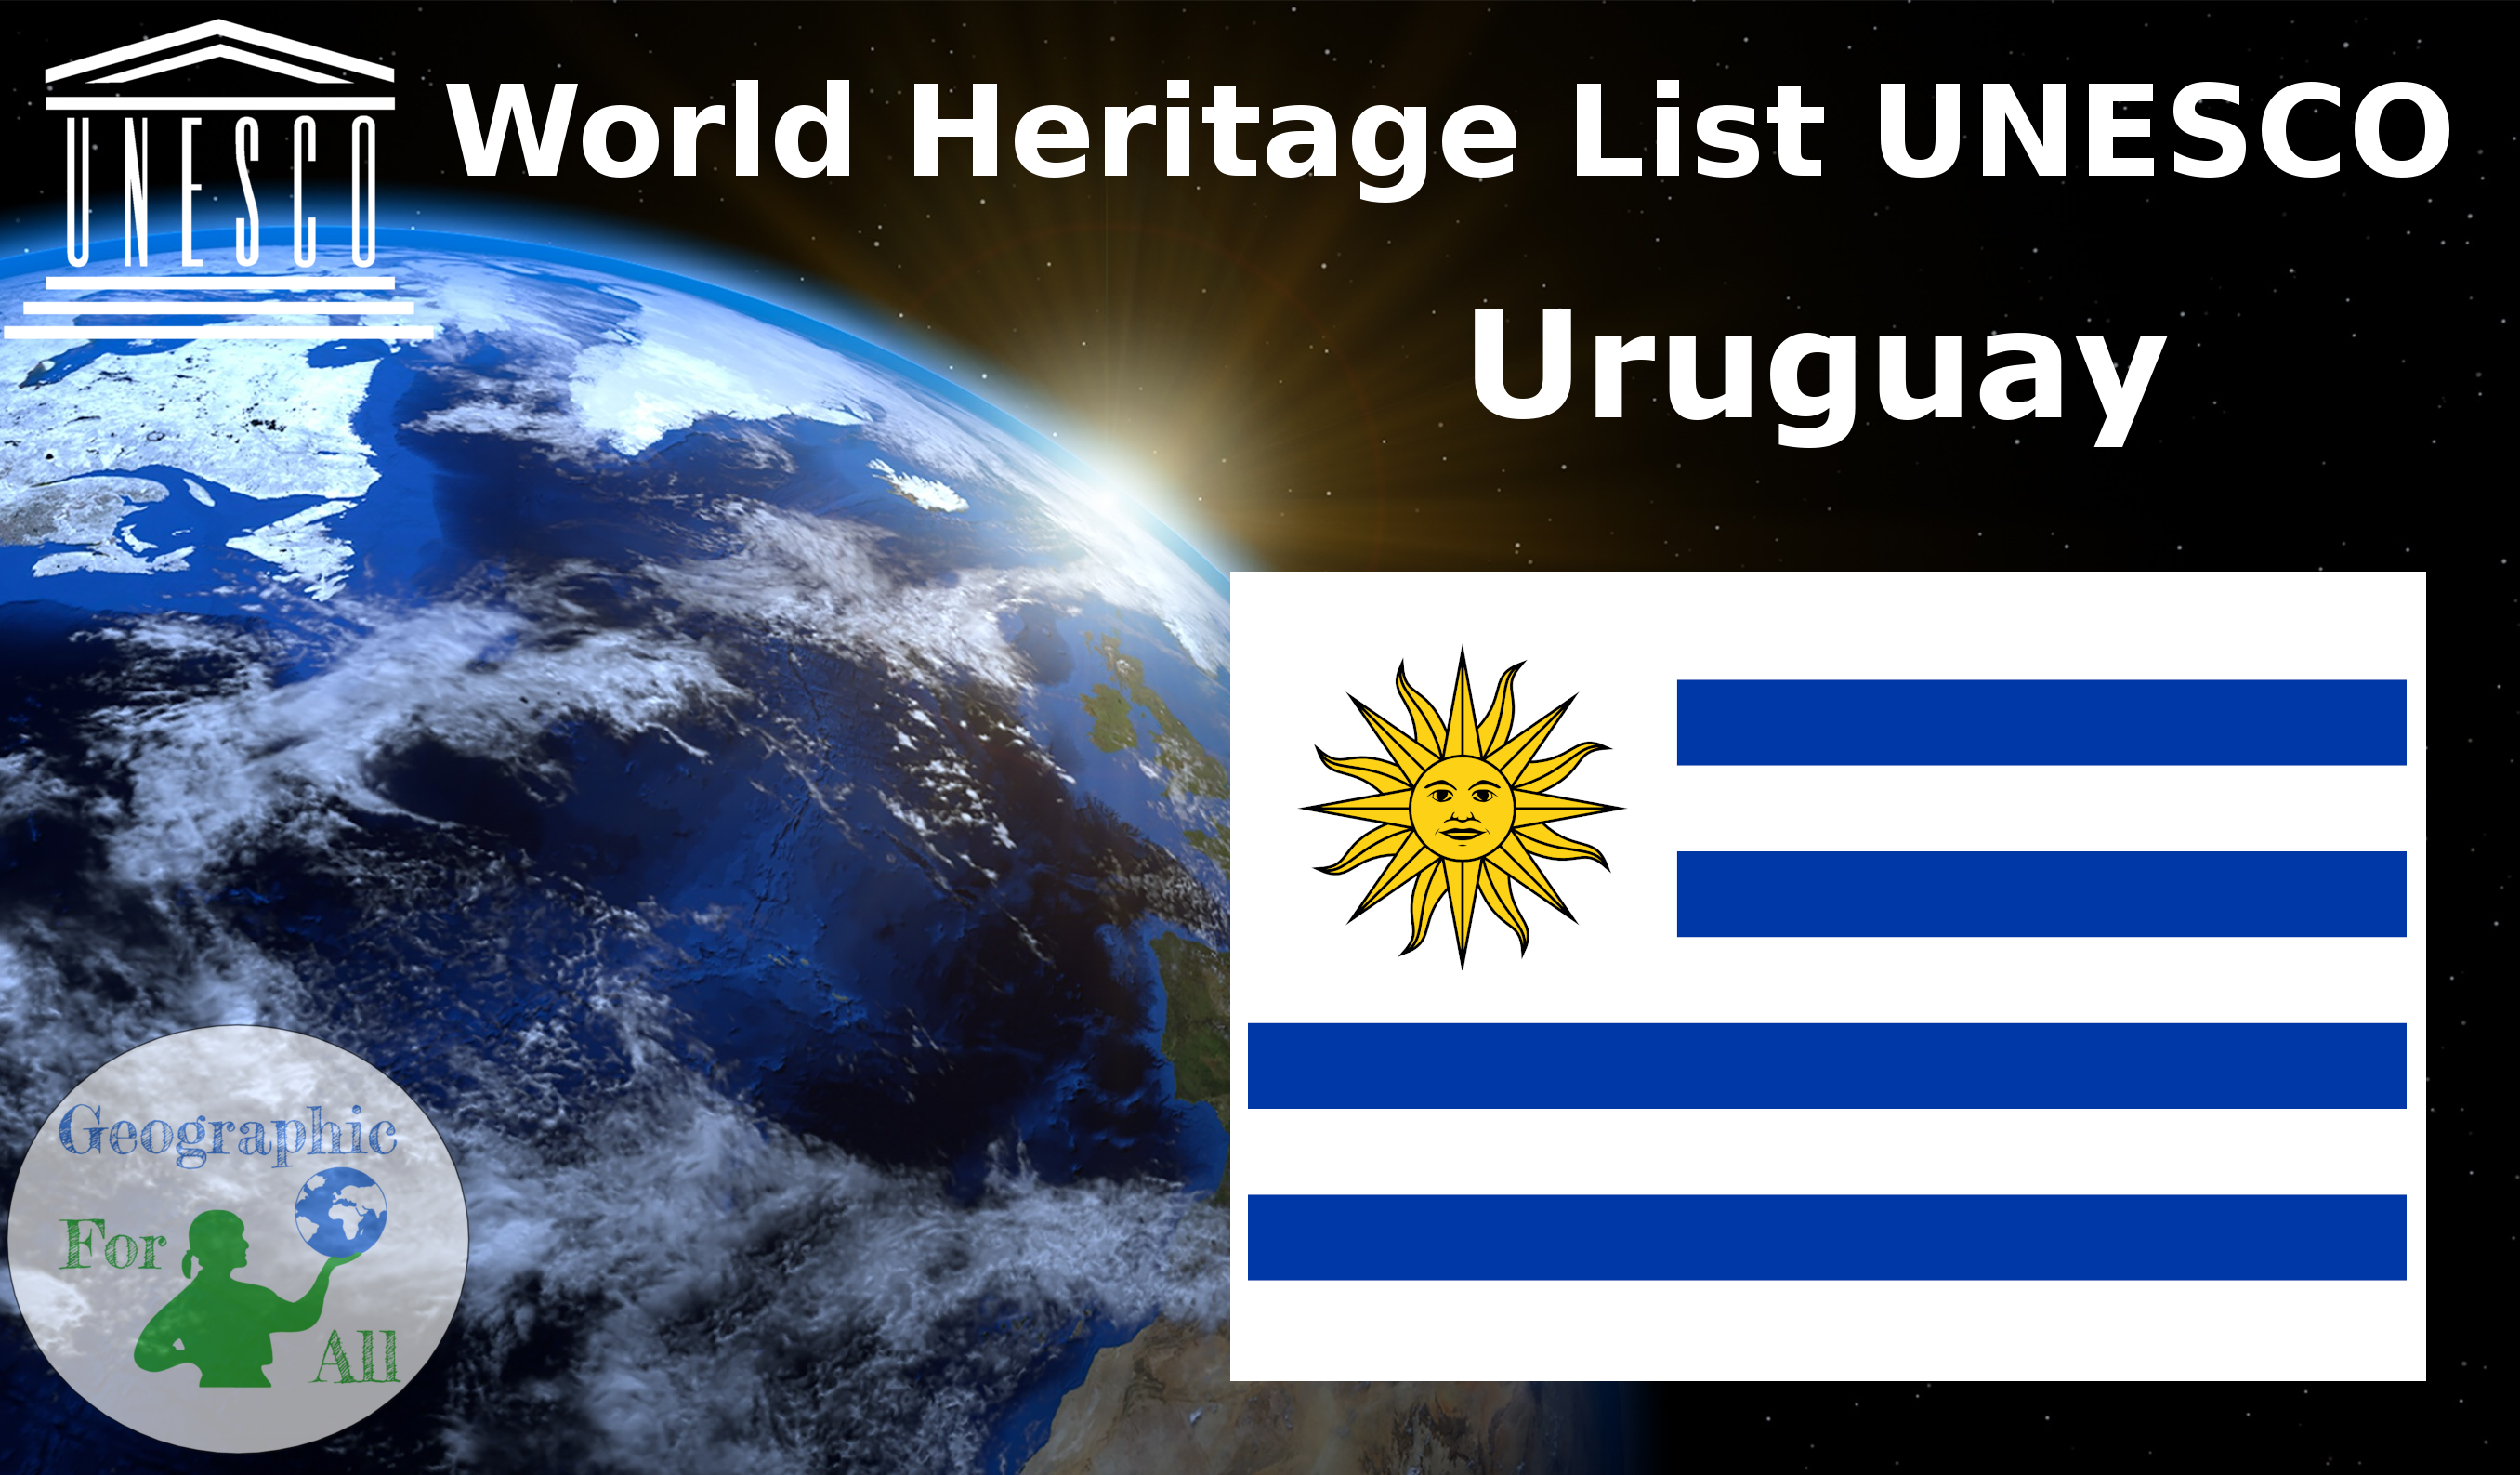 World Heritage List UNESCO - Uruguay